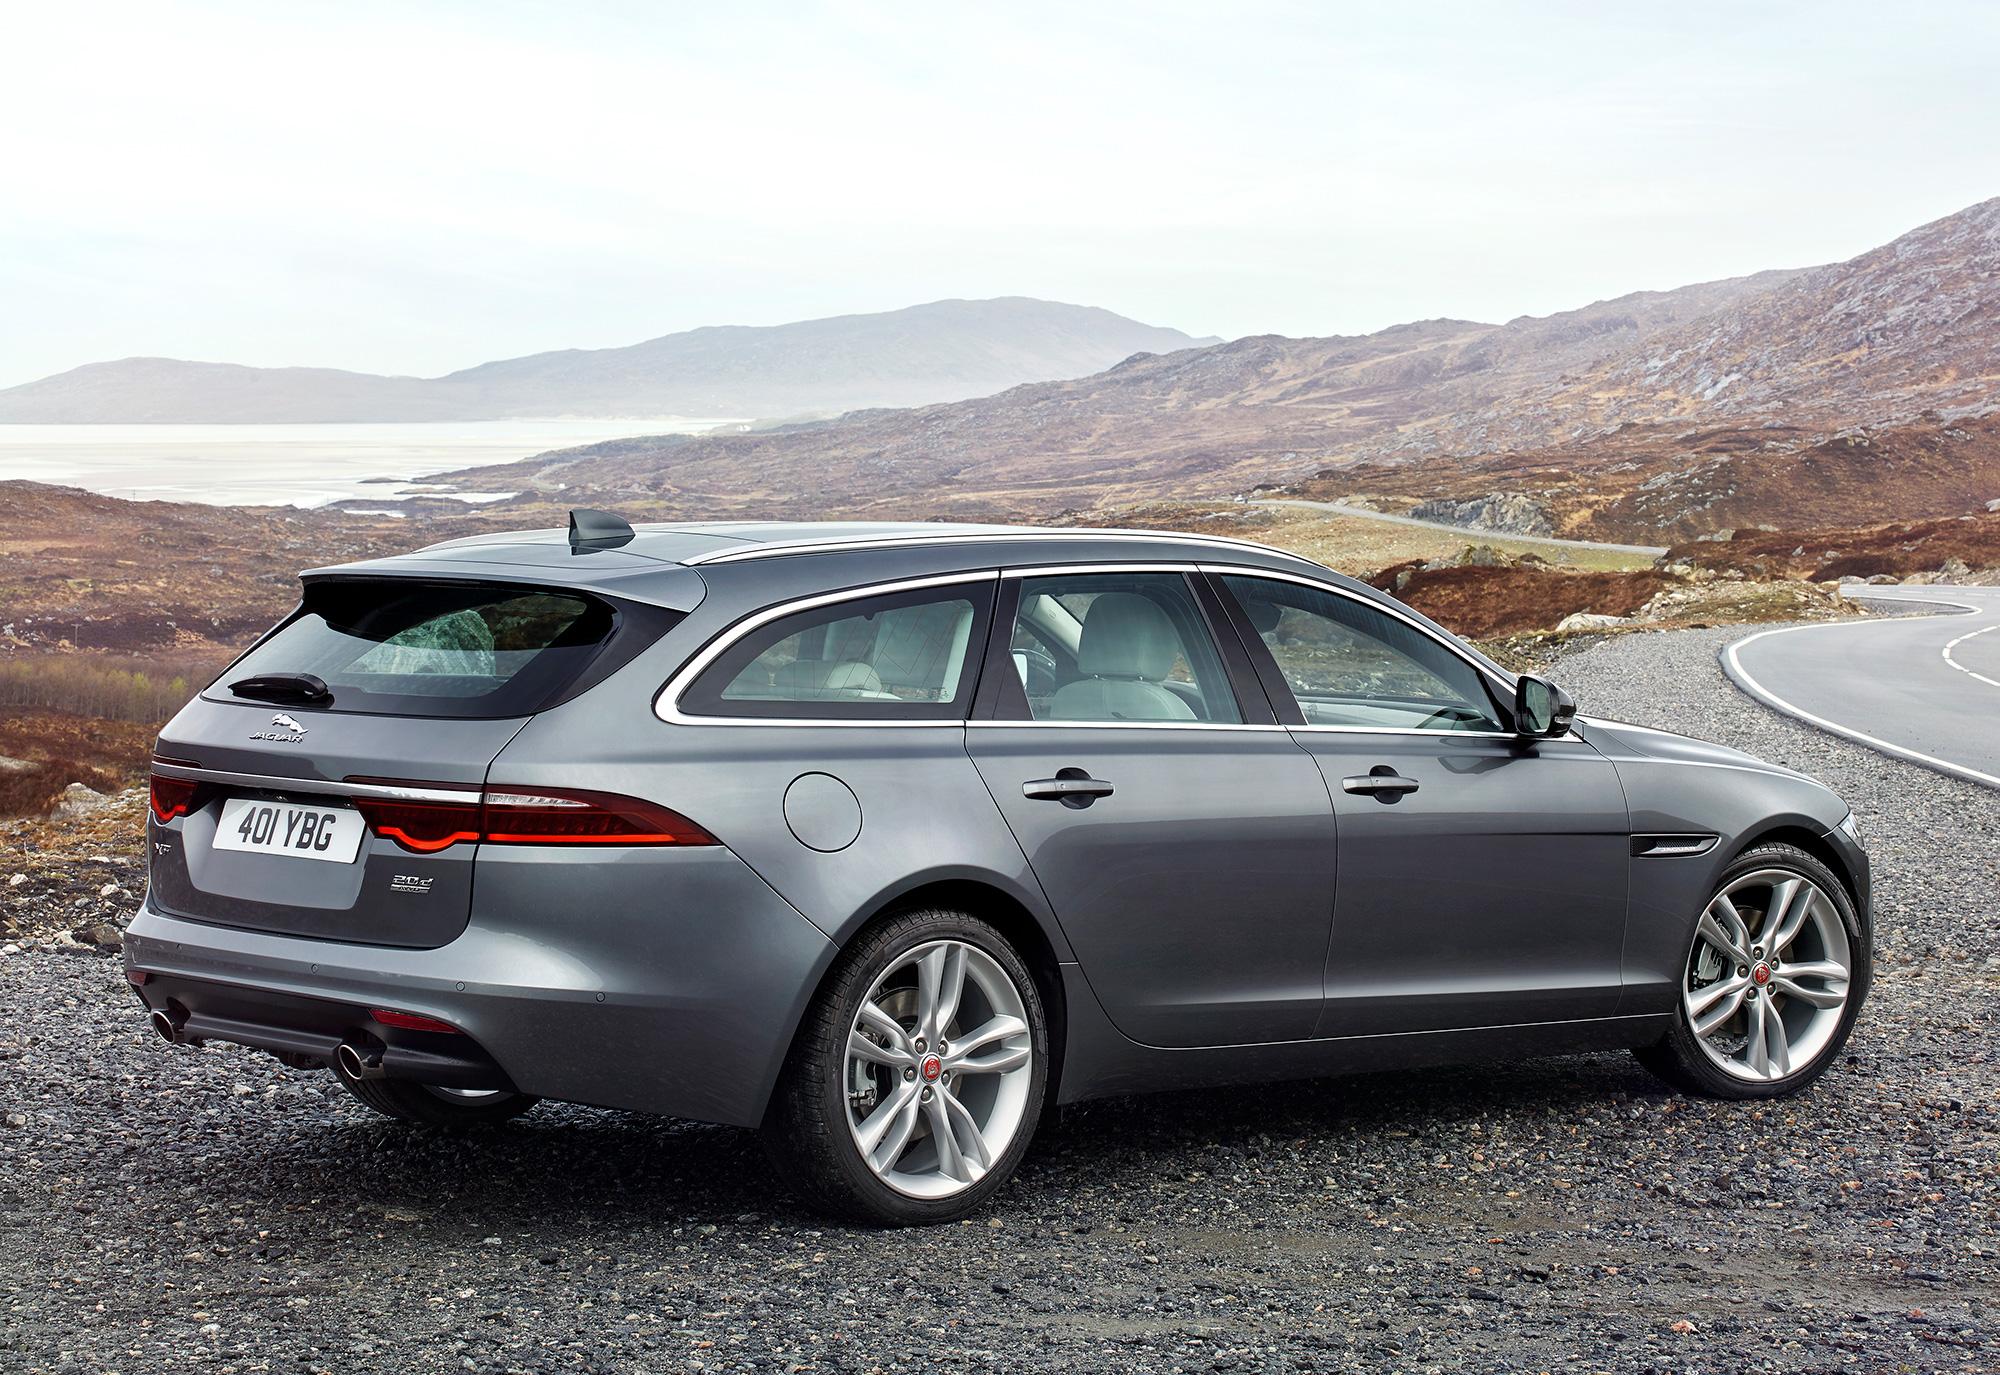 Jaguar_XF-Sportbrake_Location_Exterior_140617_11.jpg